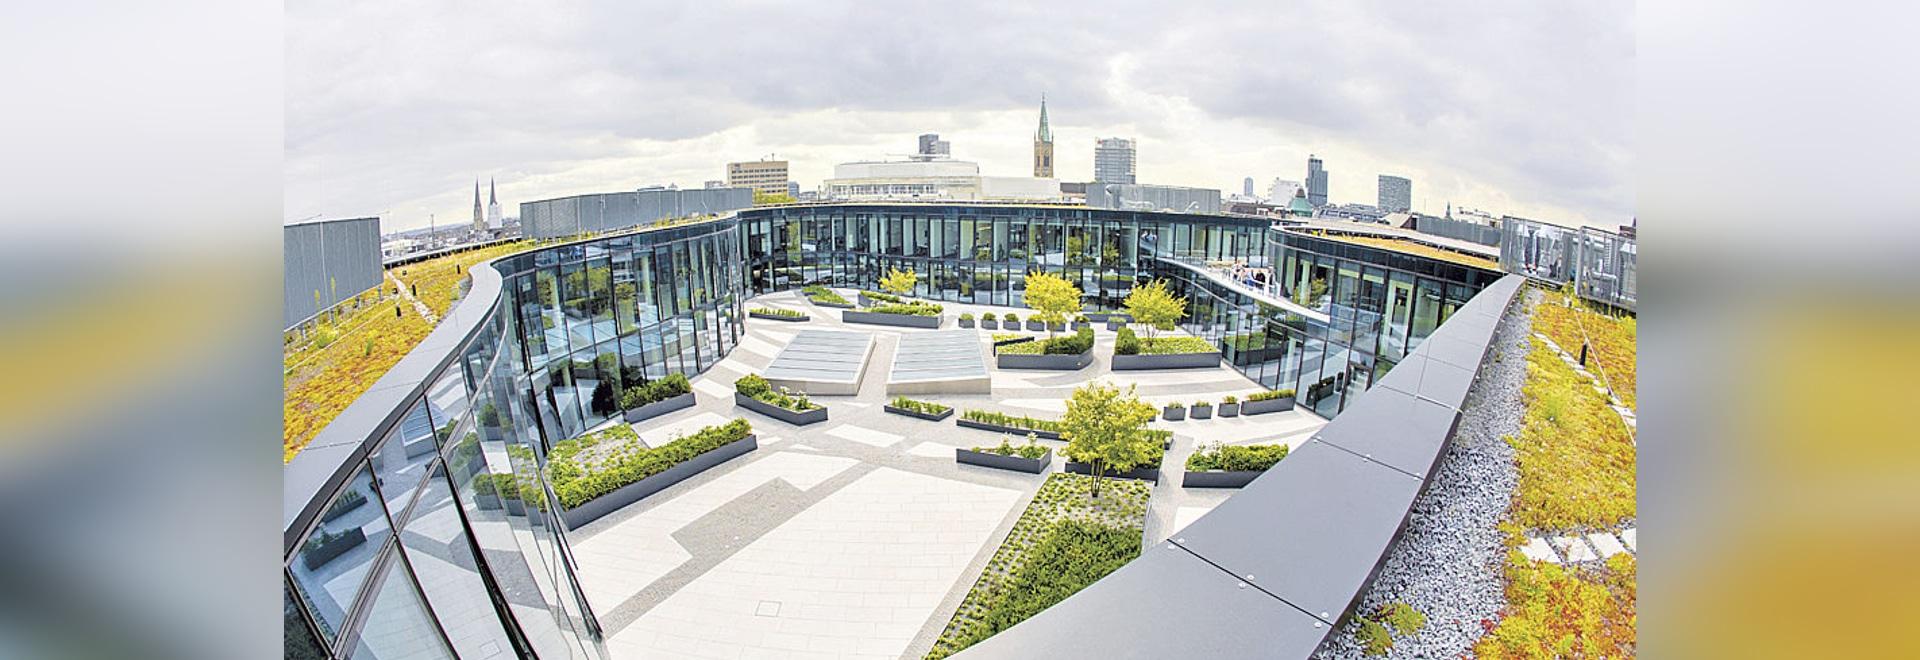 Prestigious property in Duesseldorf (Germany):